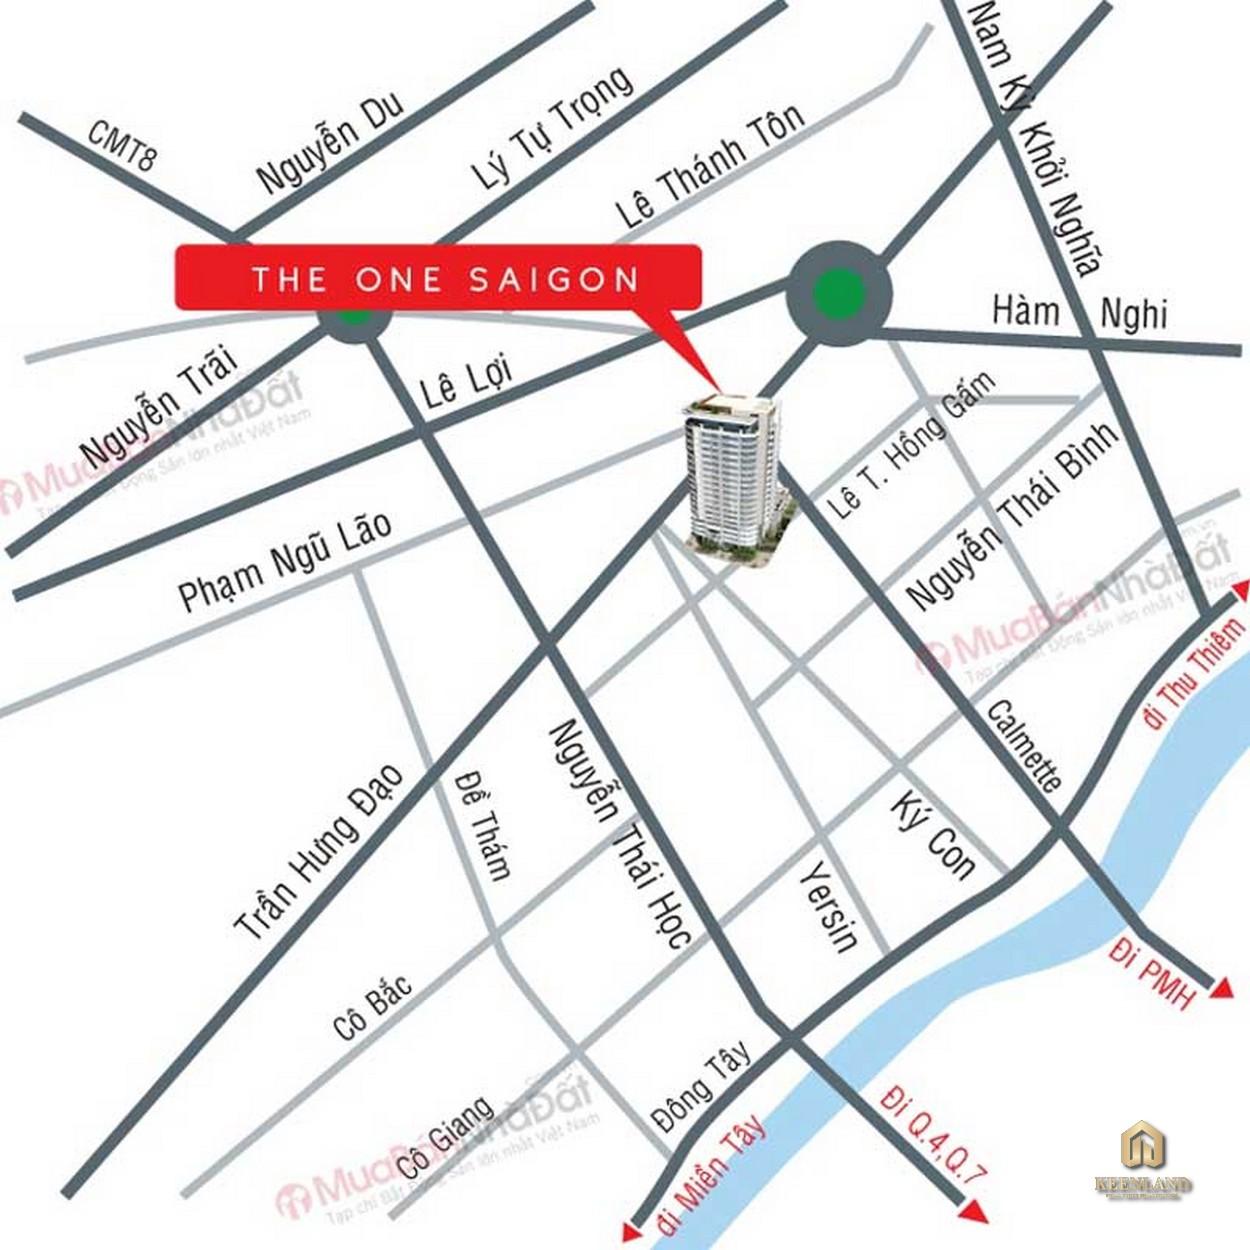 Vị trí dự án The One Saigon